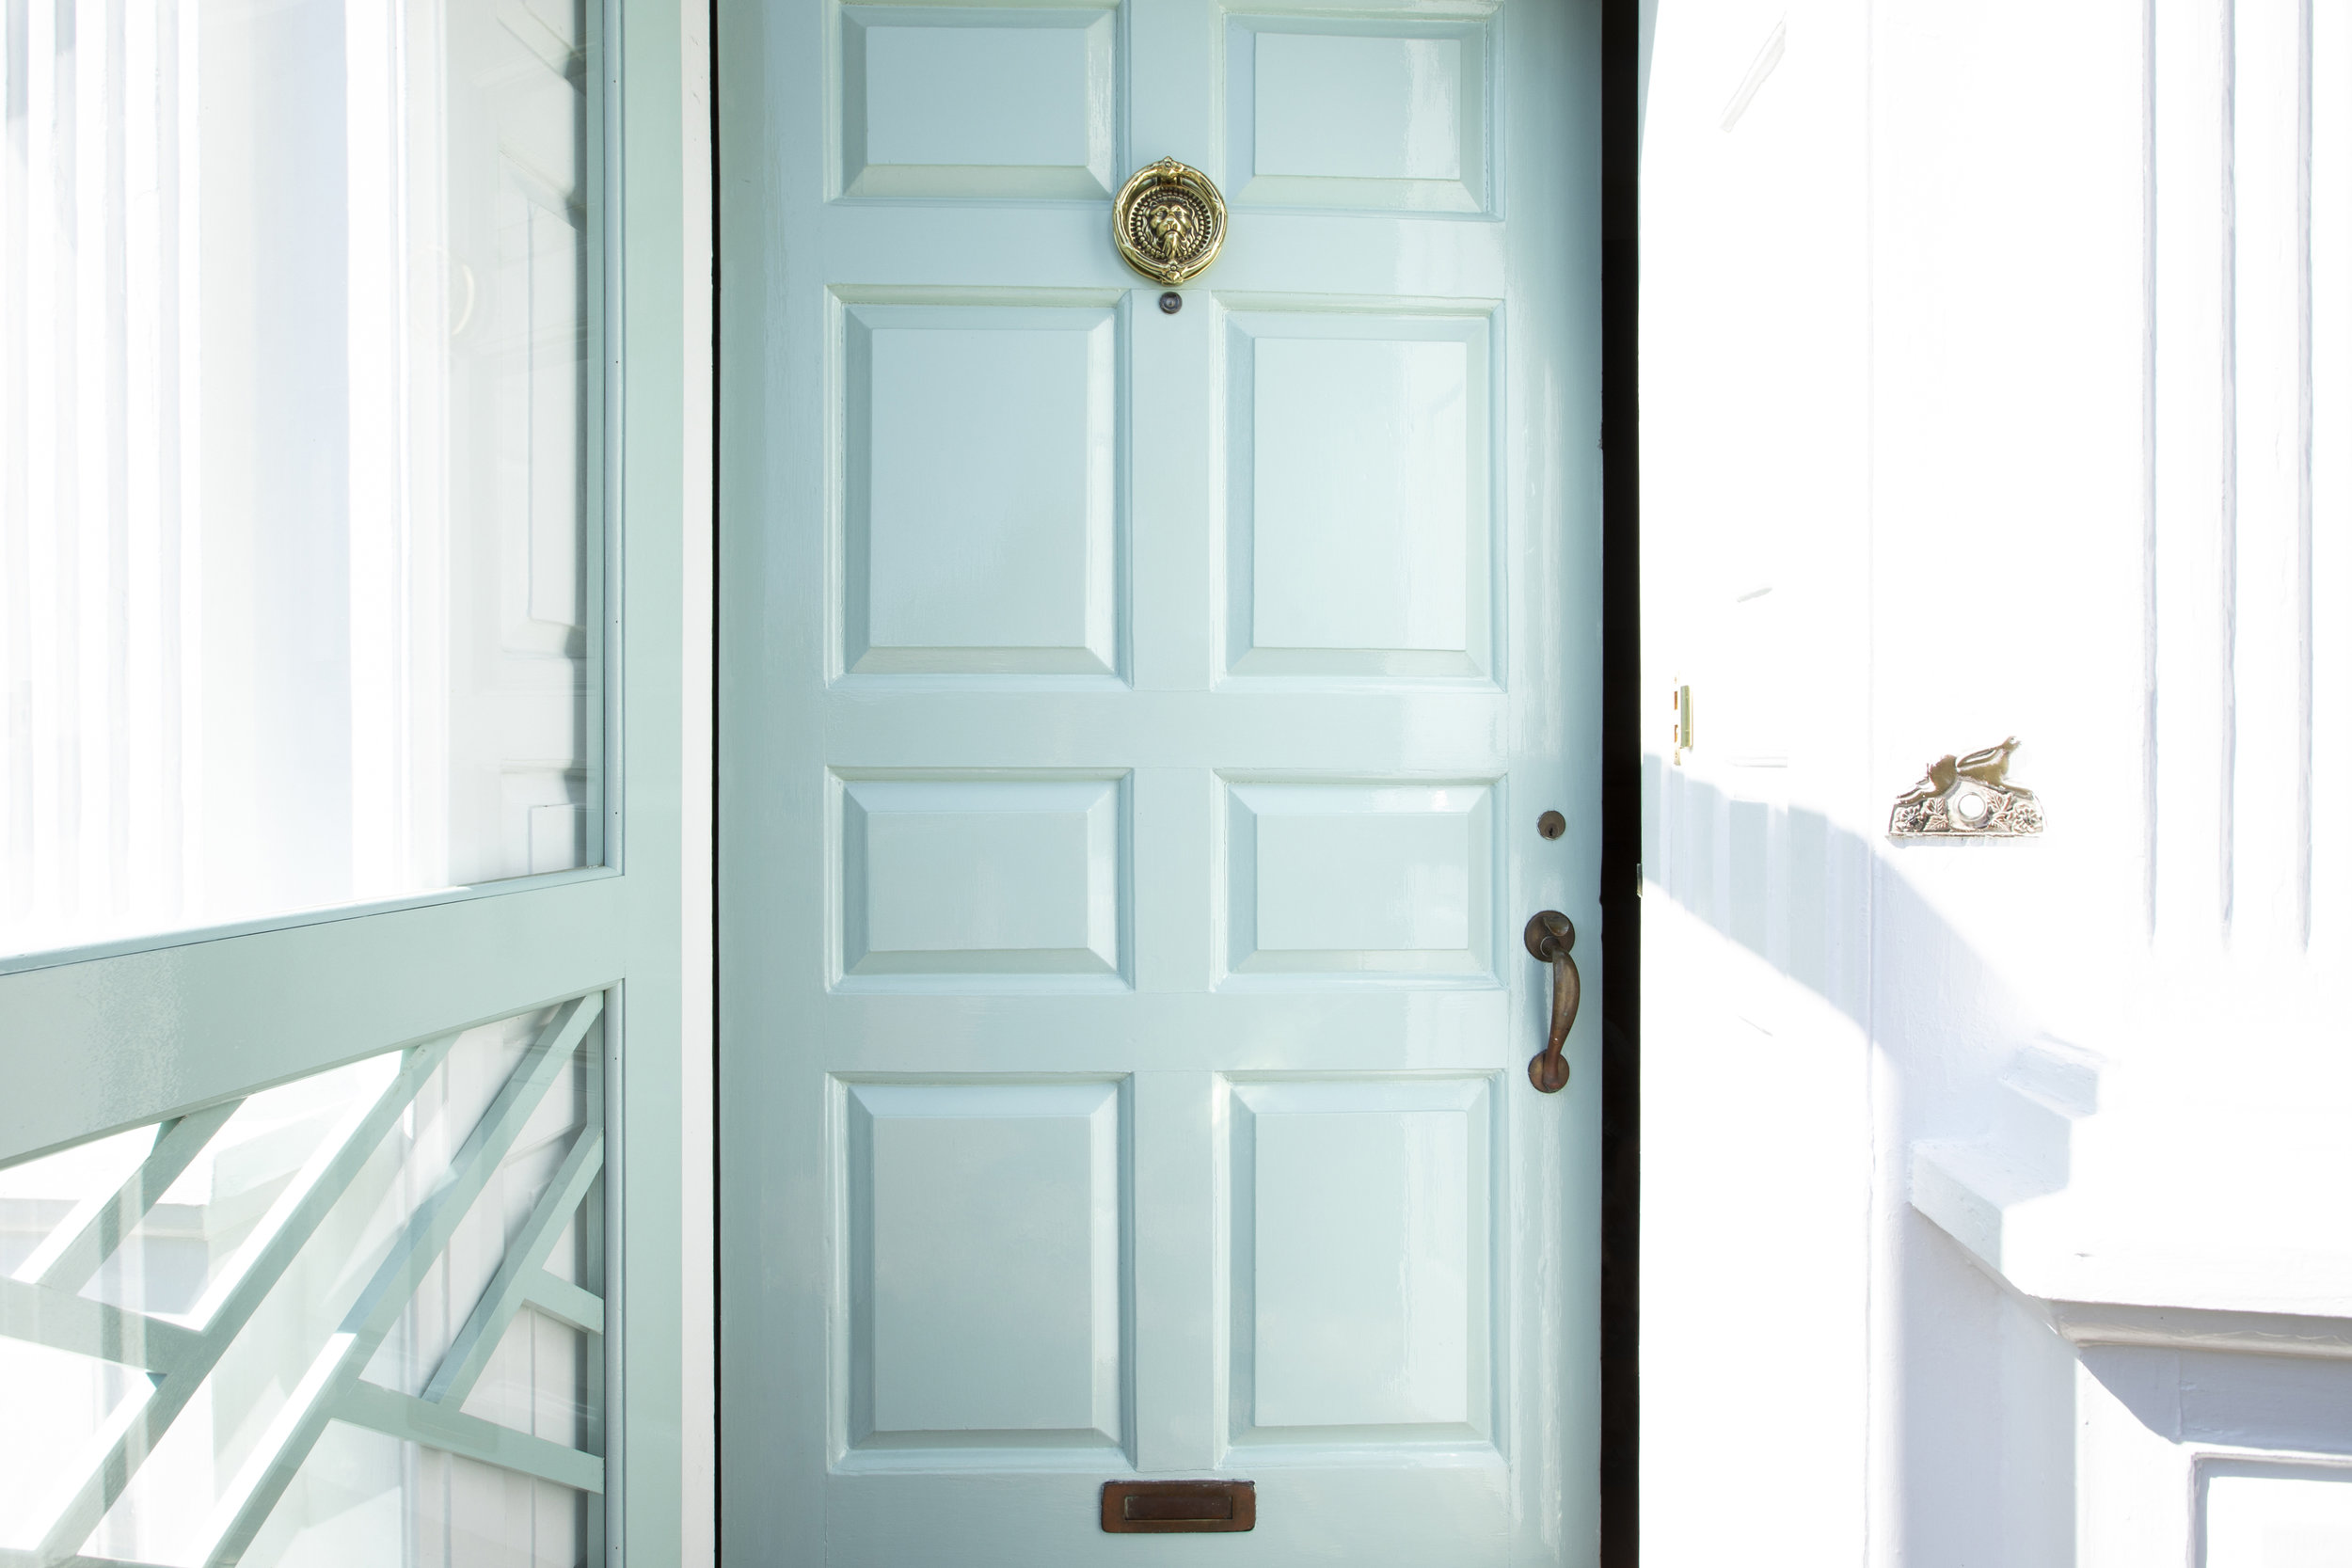 breedavis|airbnb|portfolio|25.jpg